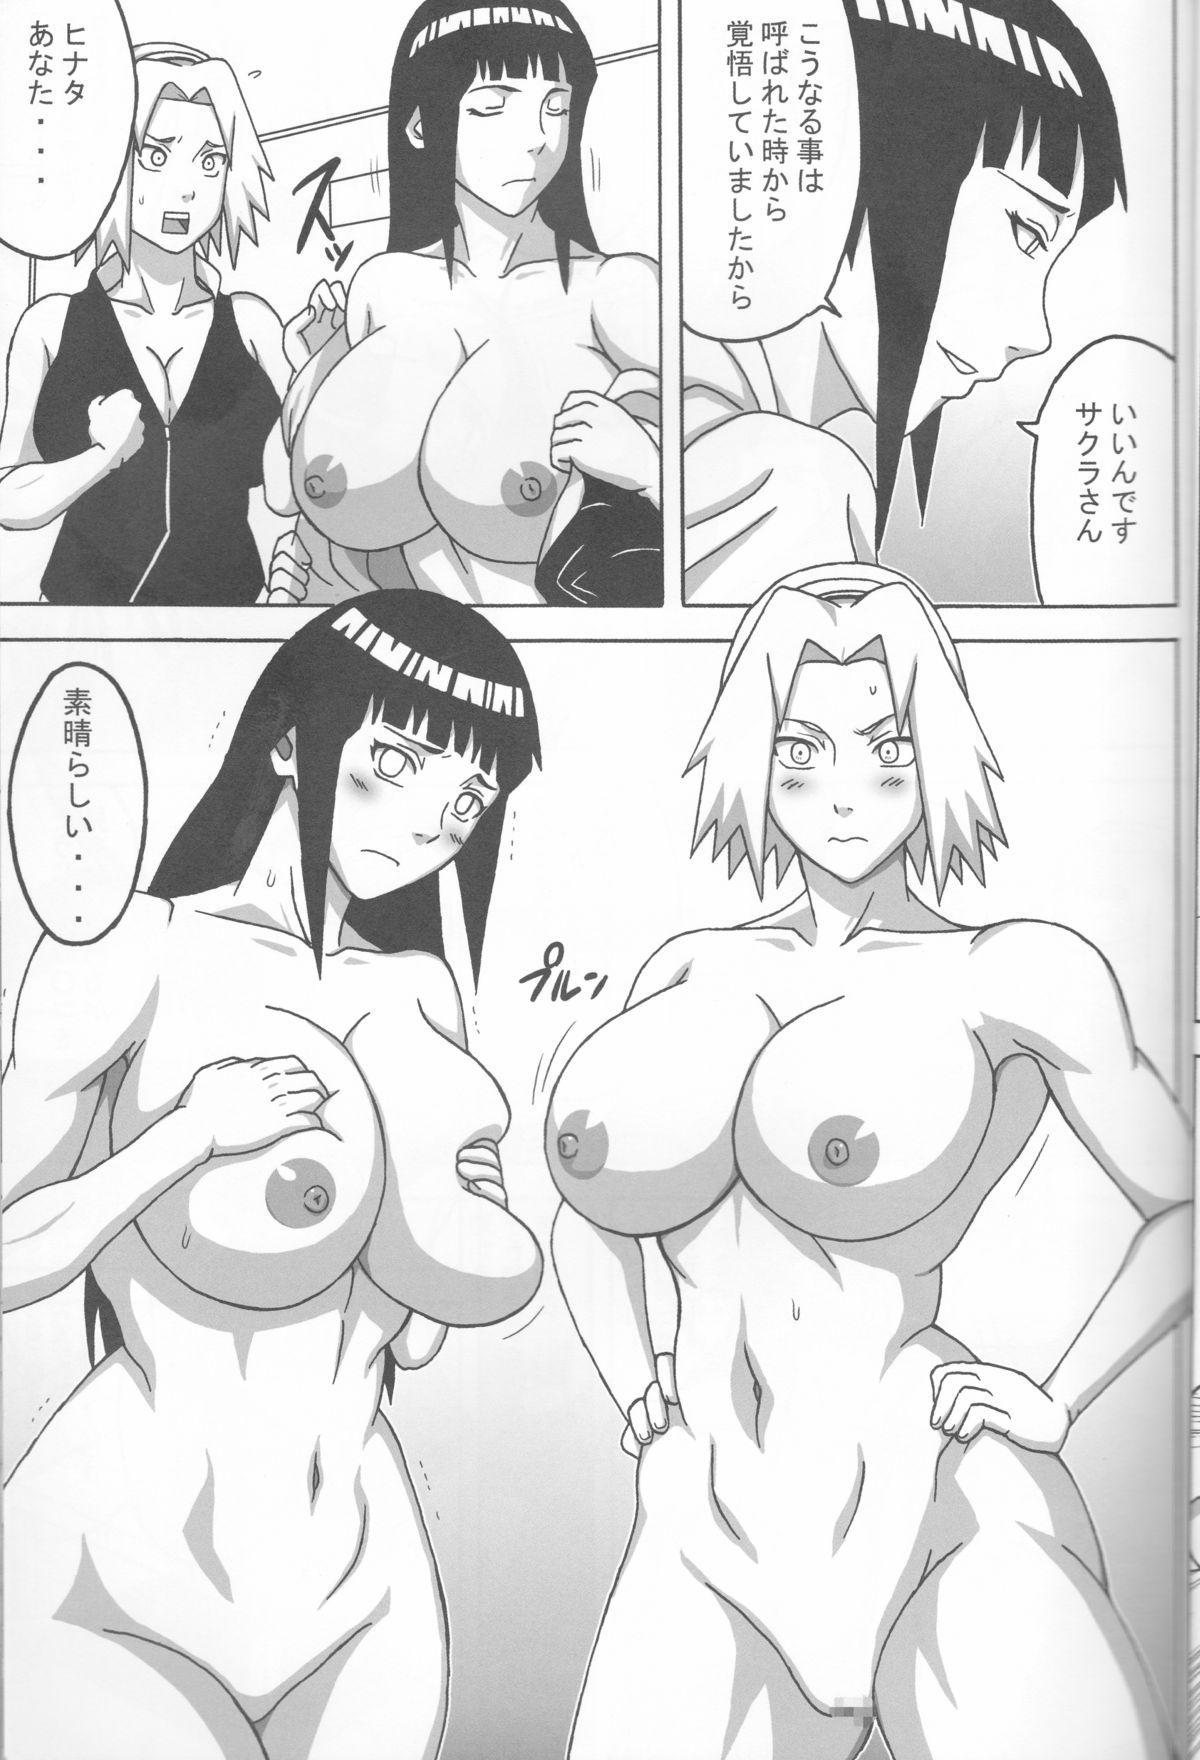 SakuHina 9